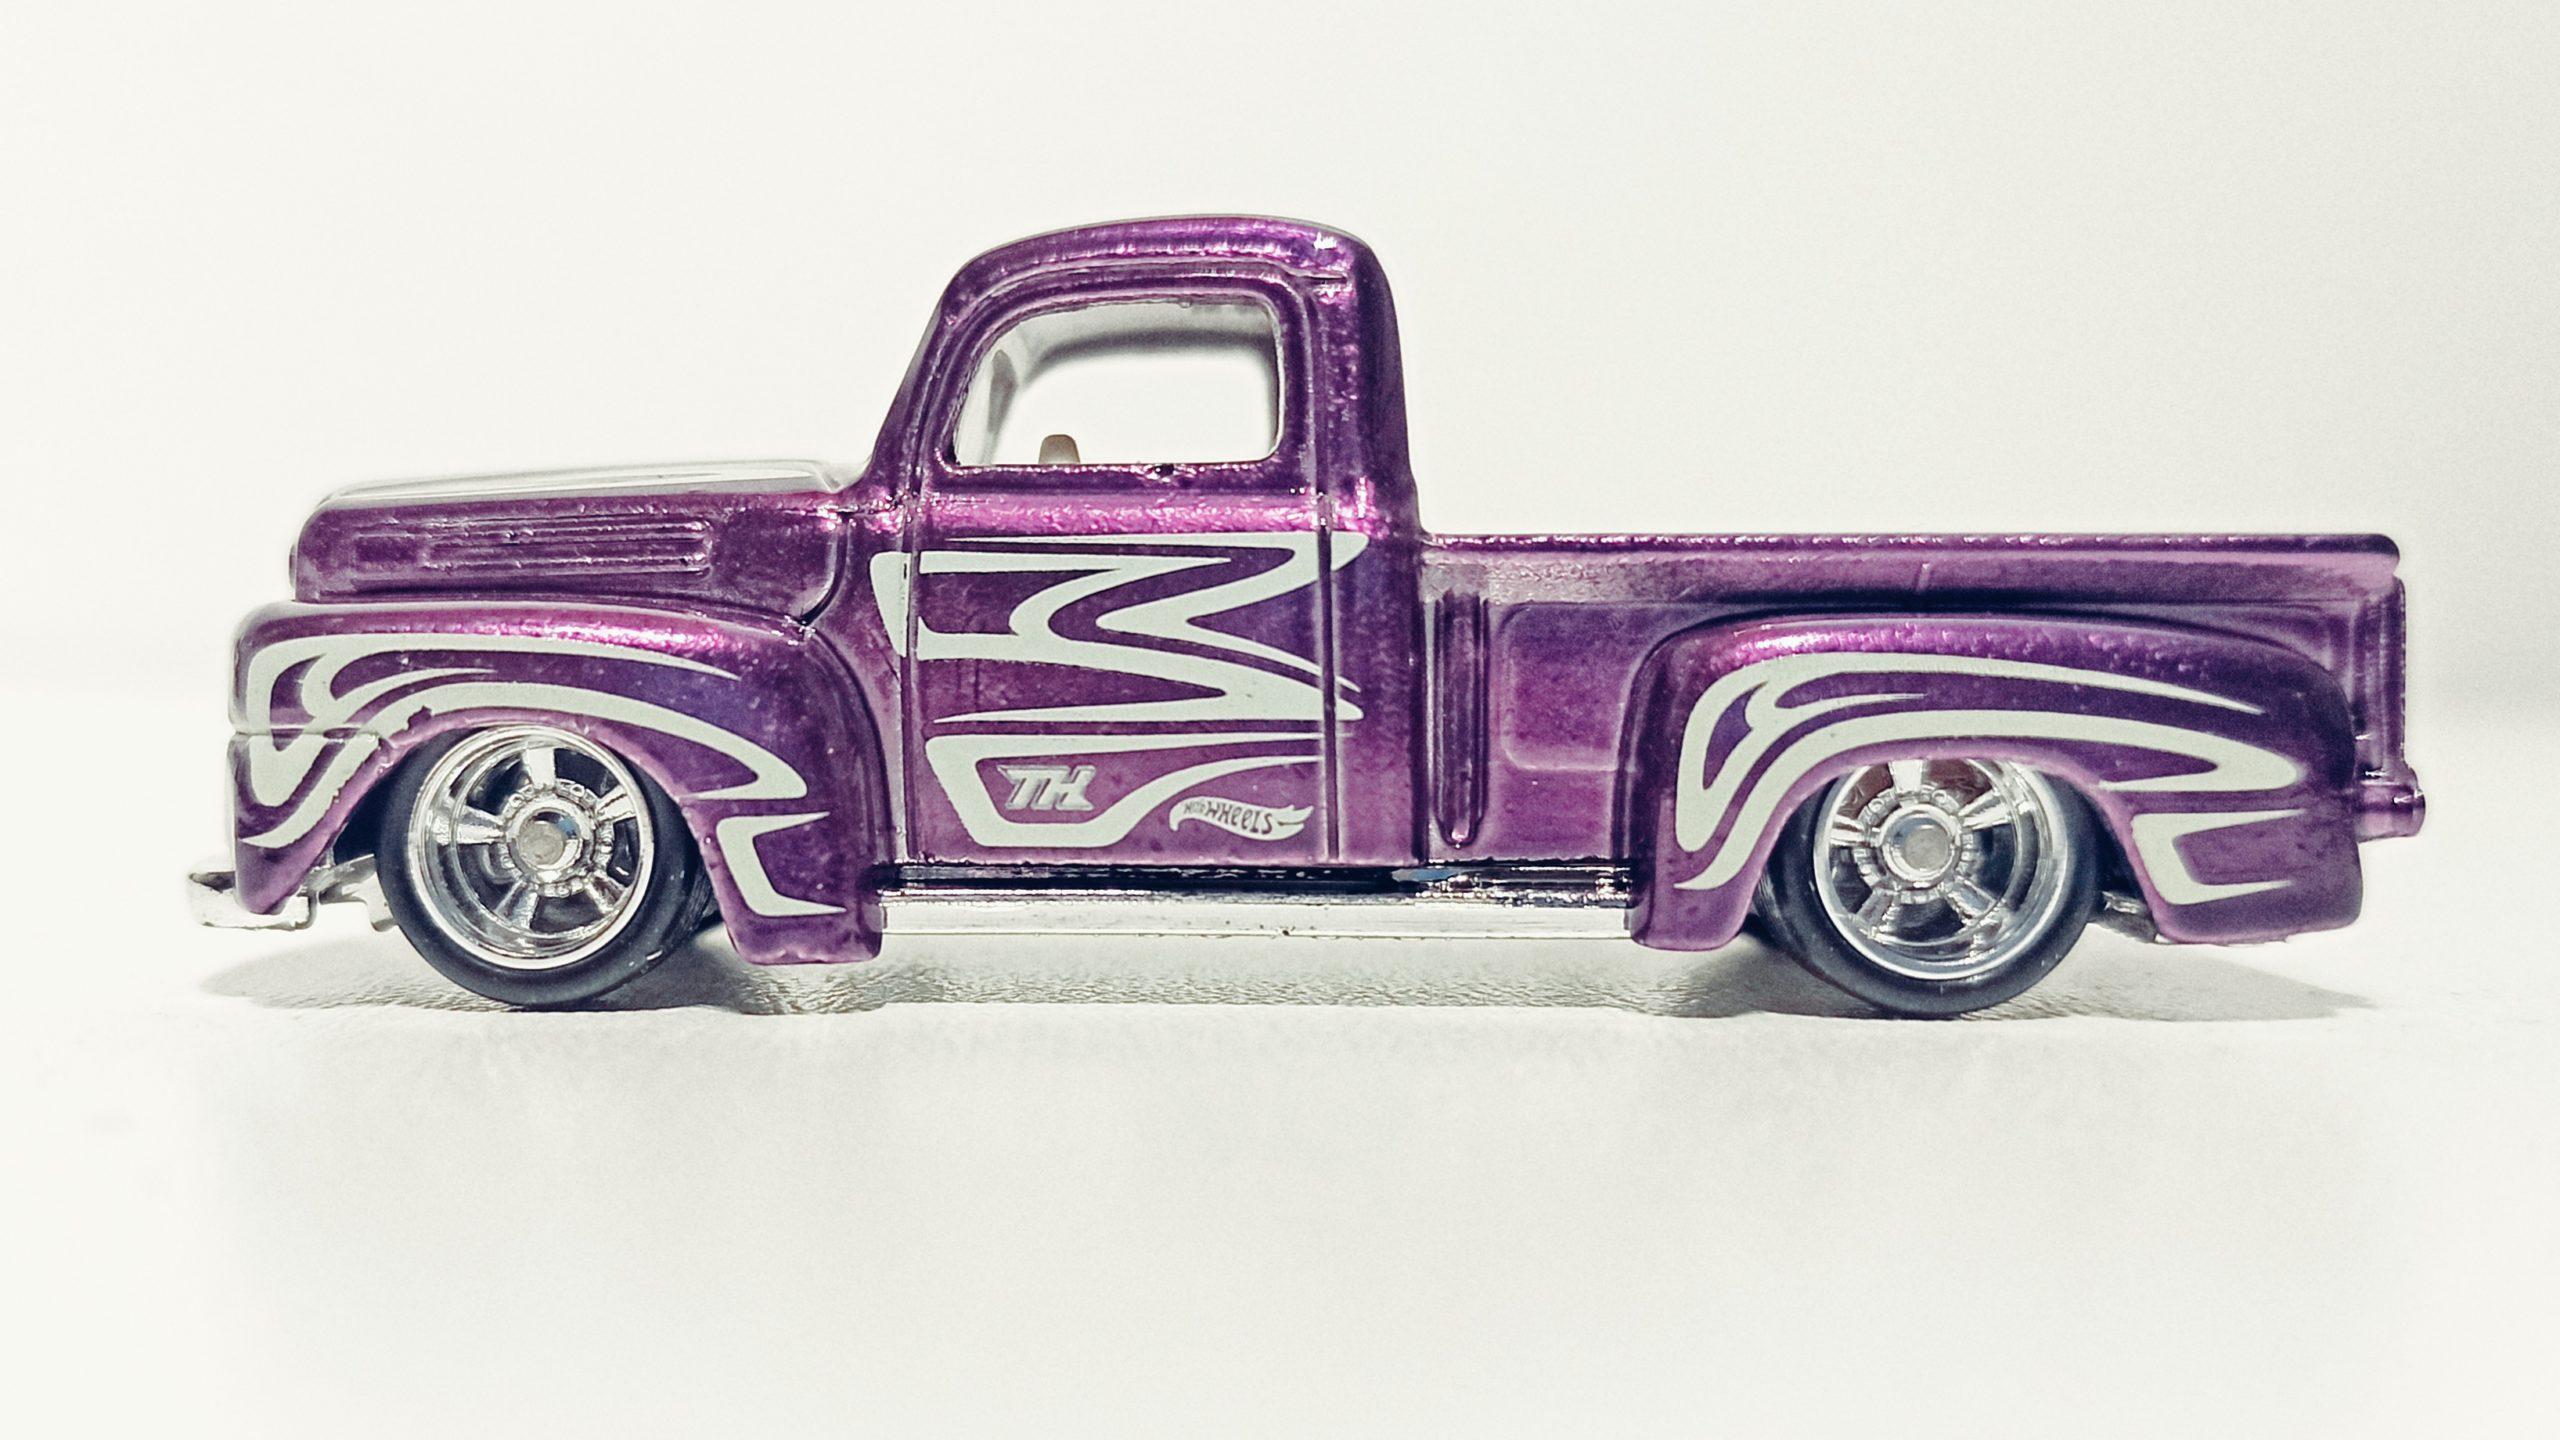 Hot Wheels '49 Ford F1 (GTD03) 2021 (225/250) HW Hot Trucks (6/10) spectraflame purple Super Treasure Hunt (STH) side